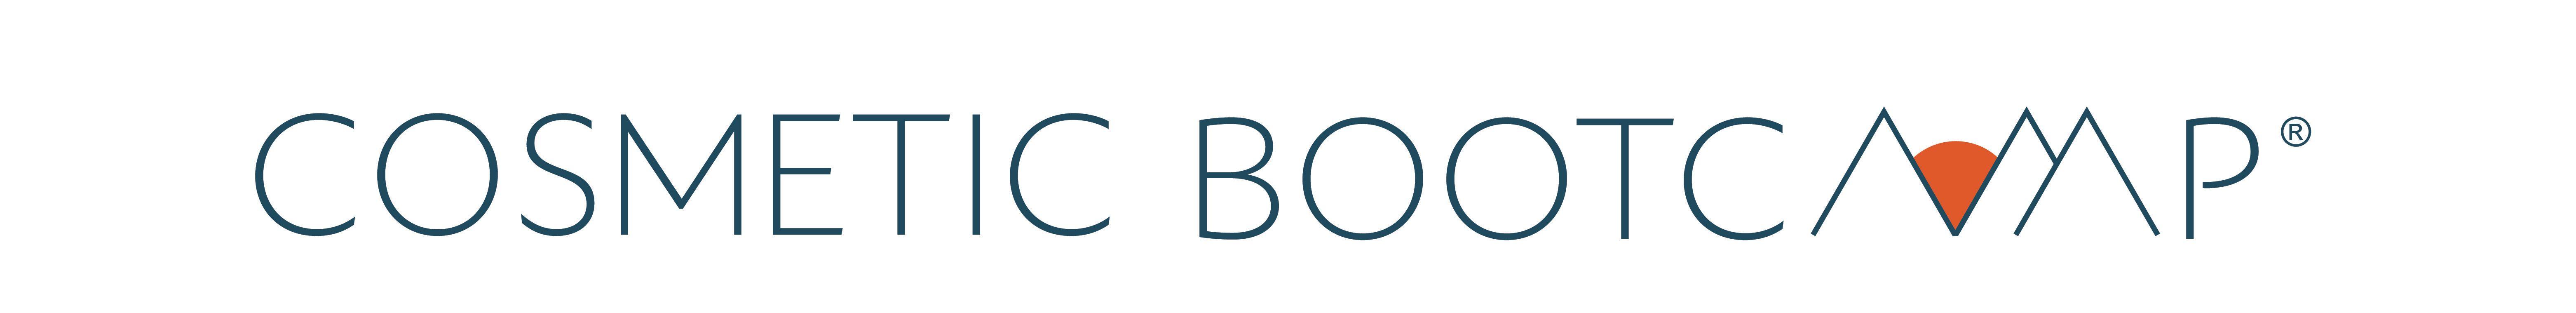 Cosmetic Bootcamp logo